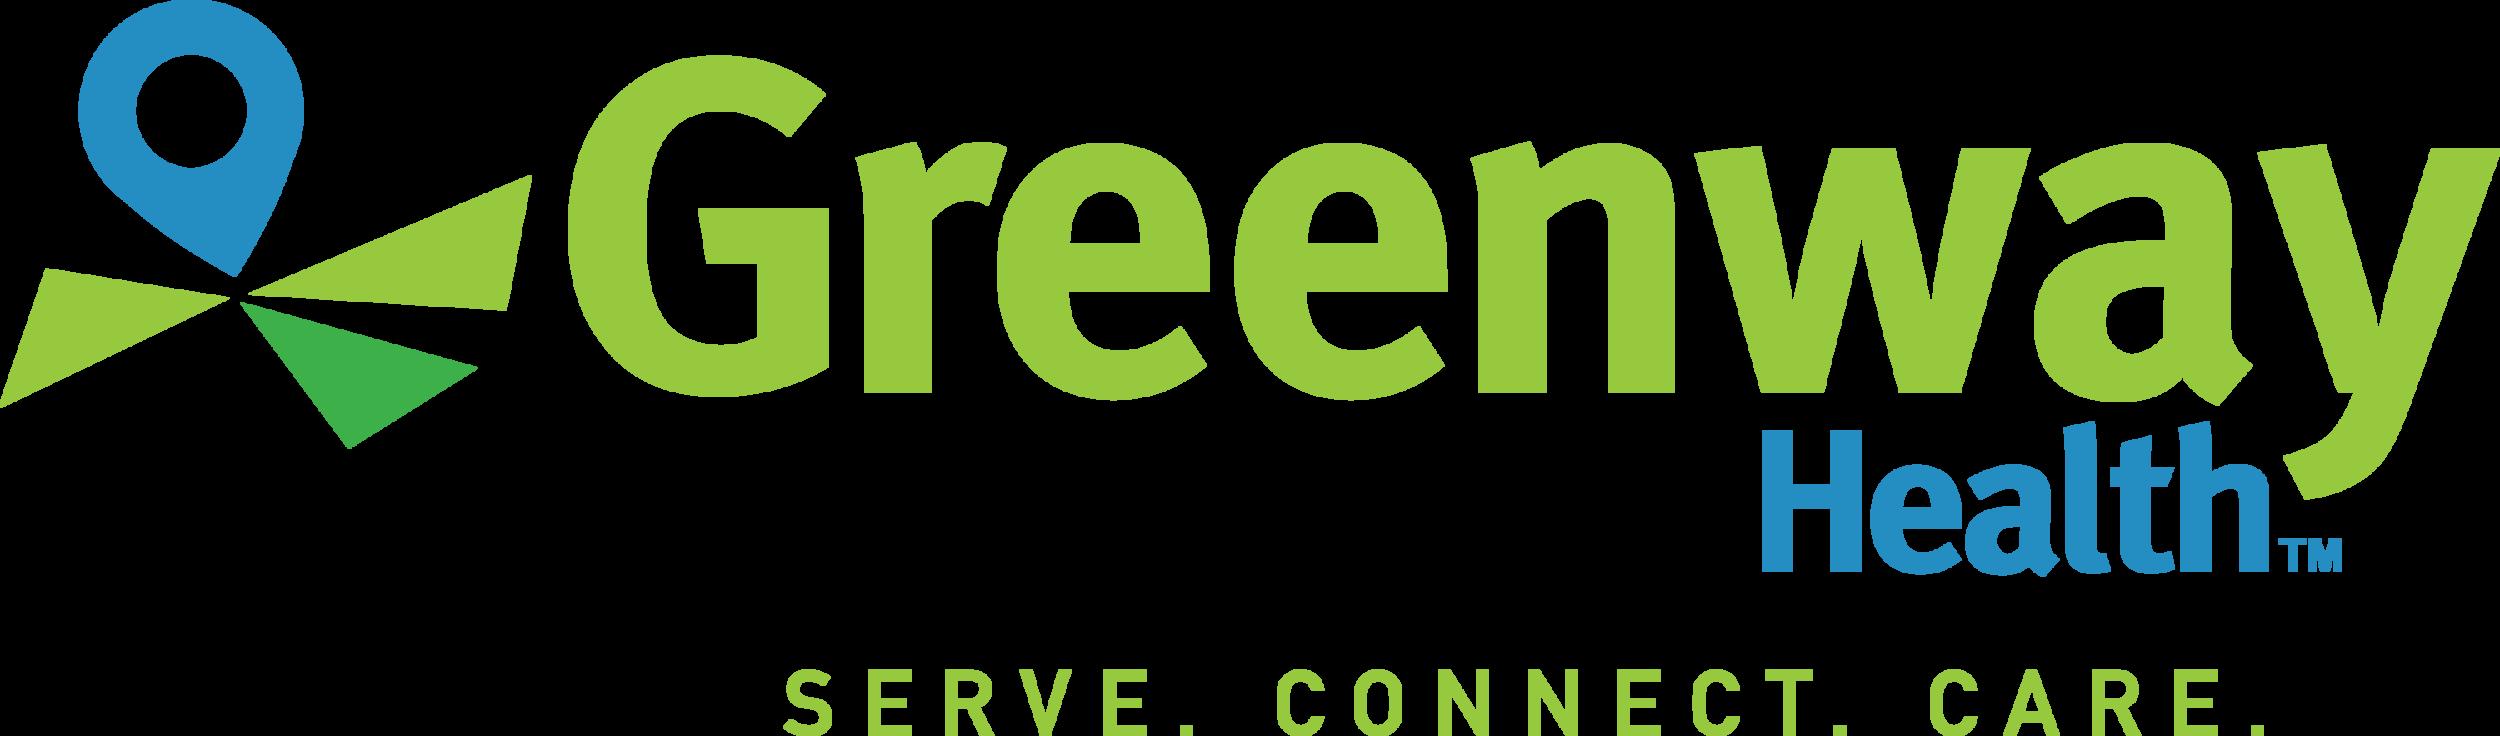 greenway health avhana health